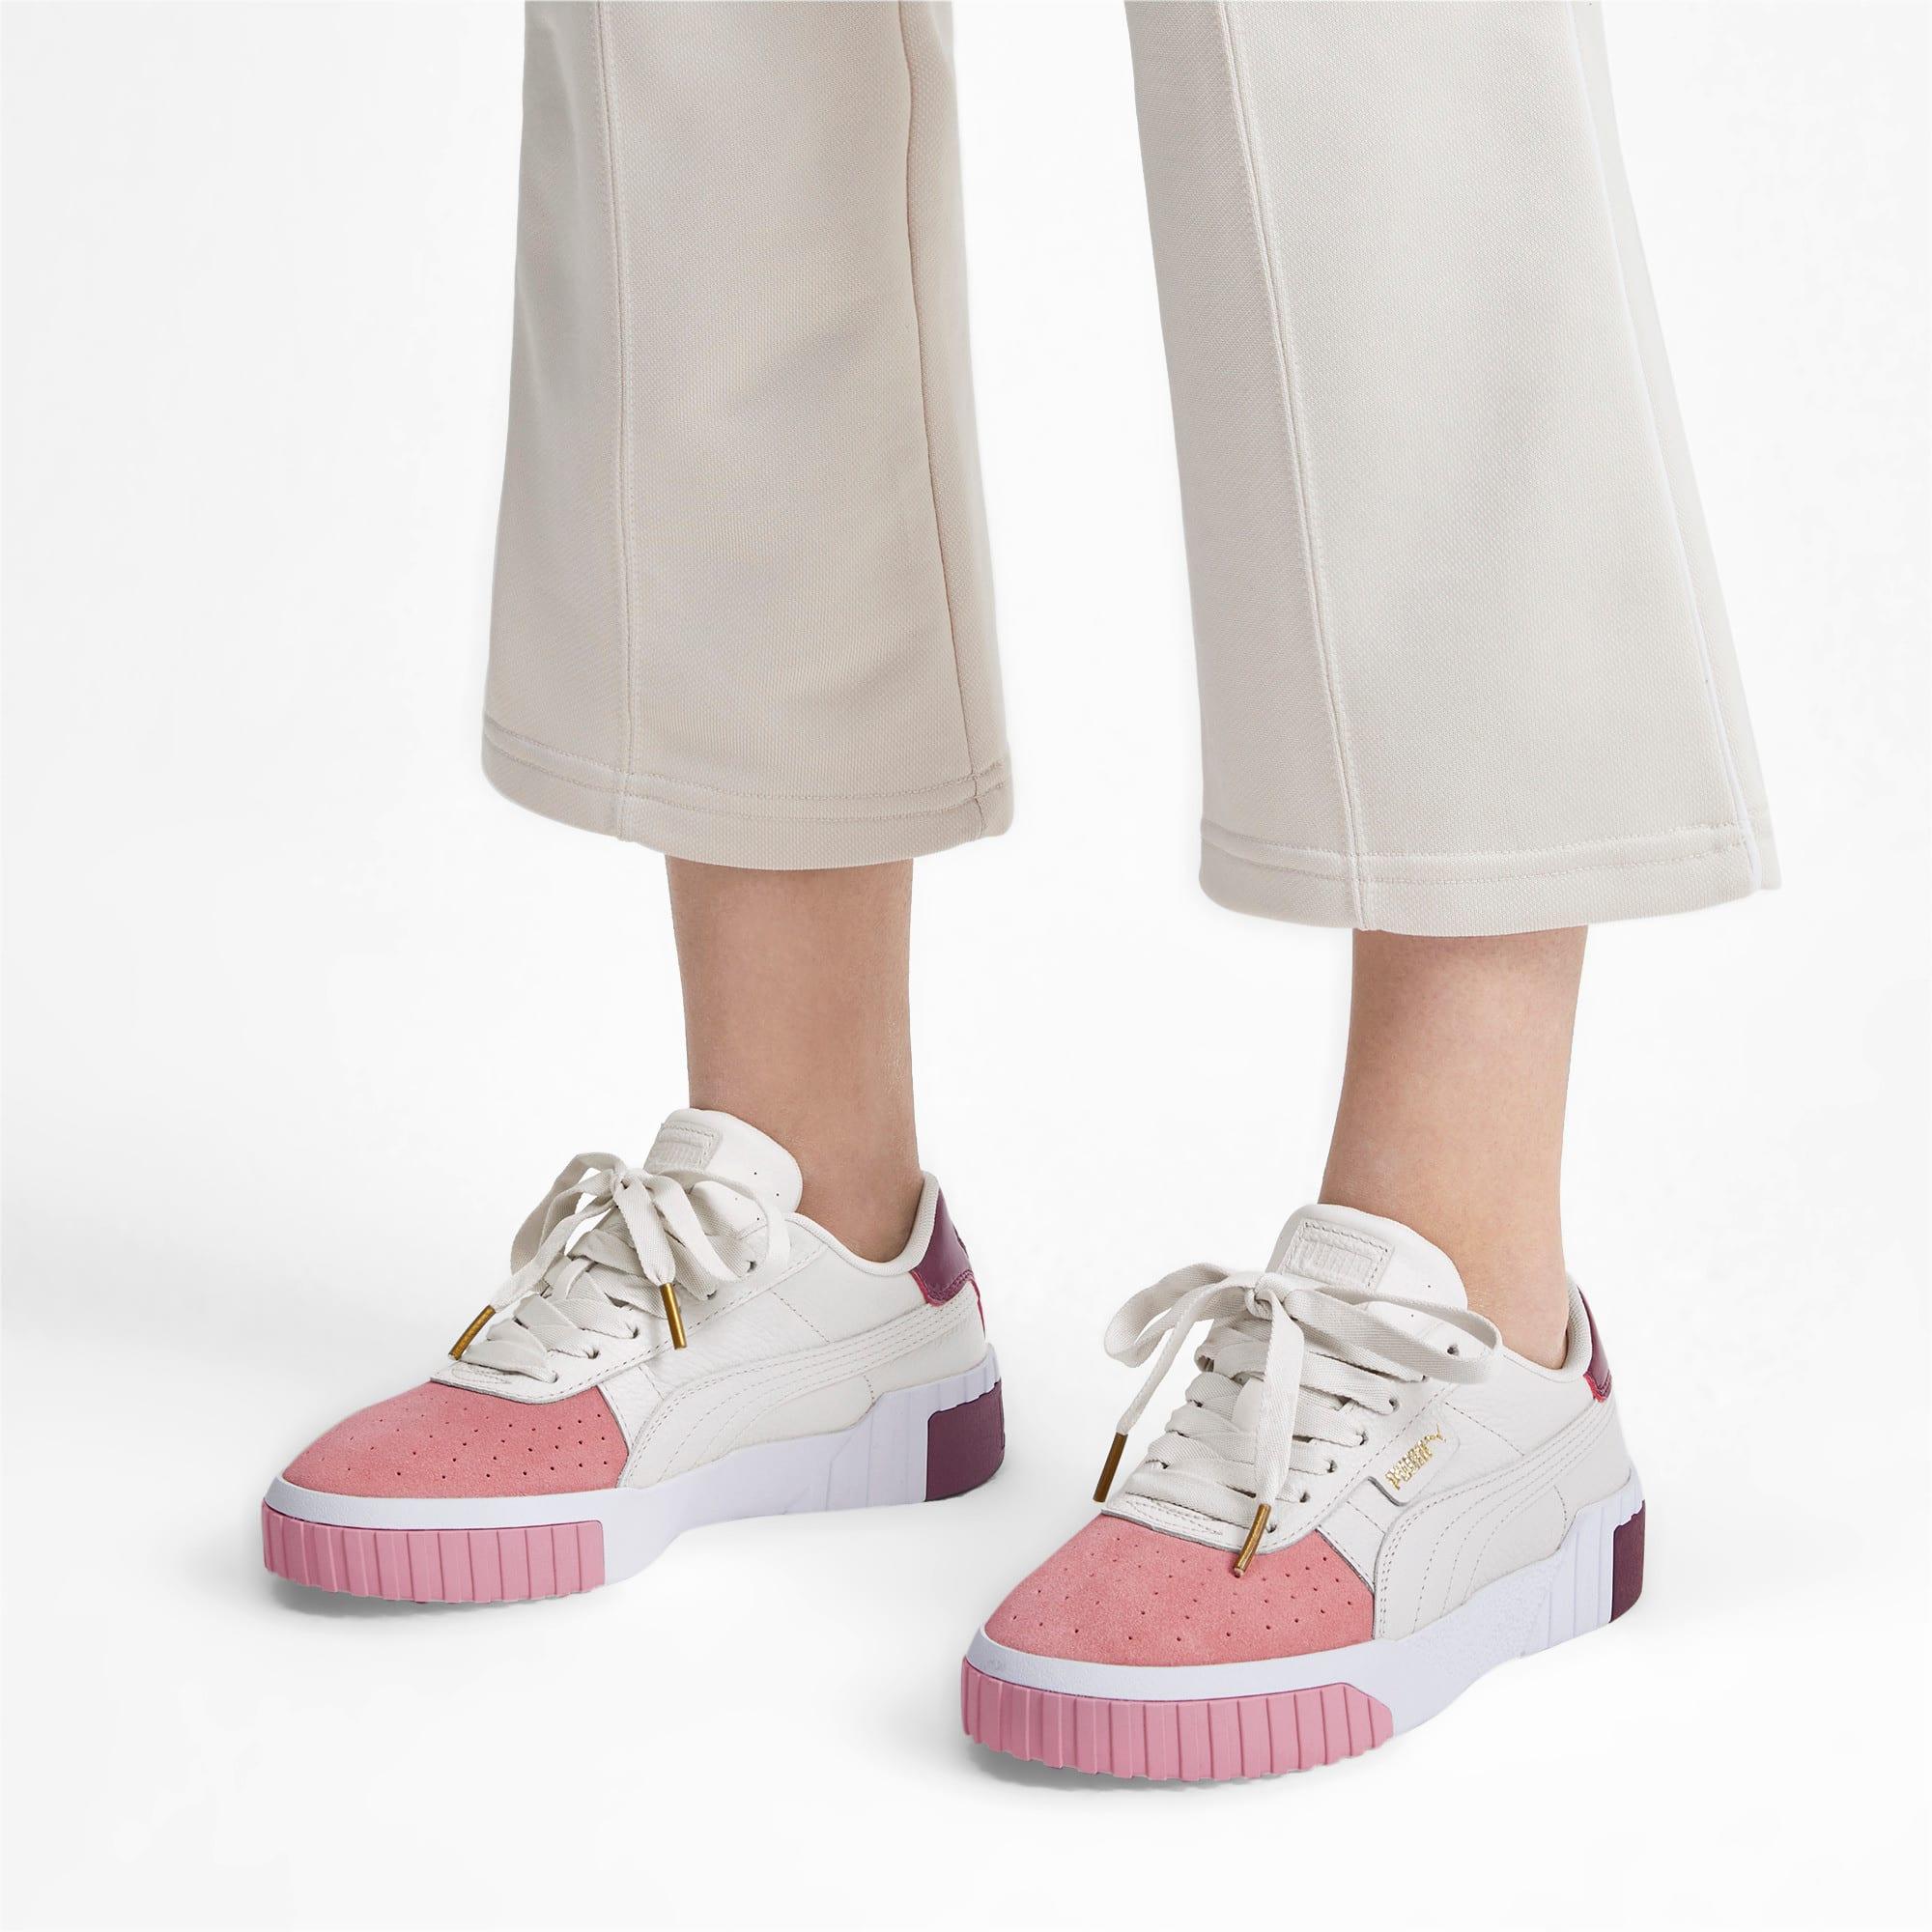 Thumbnail 2 of Cali Remix Women's Sneakers, Pastel Parchment-Bridal Rose, medium